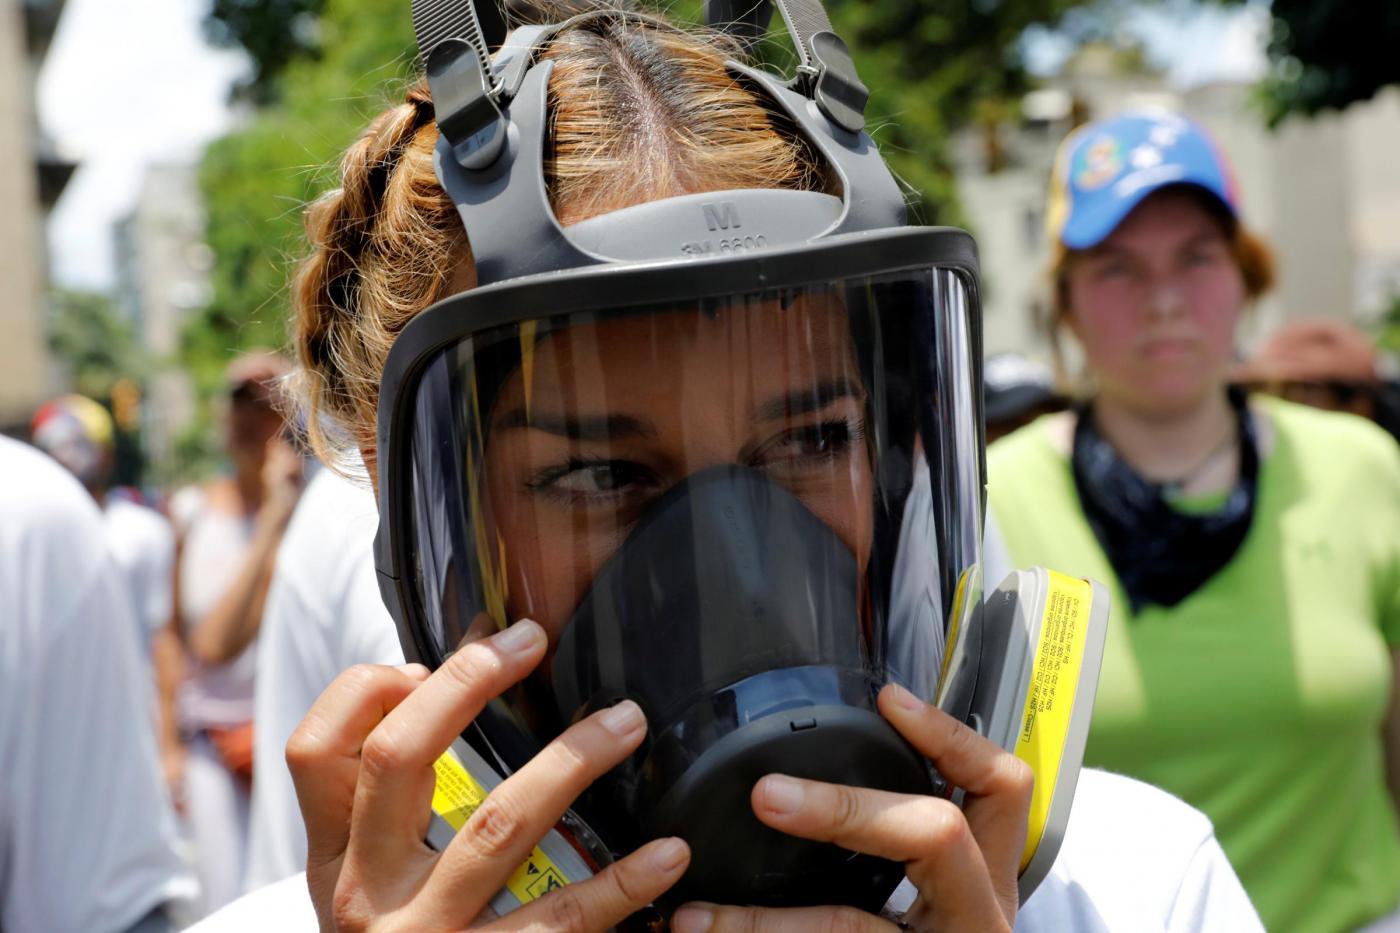 Venezuela, continuano le proteste contro il presidente Nicolas Maduro a Caracas